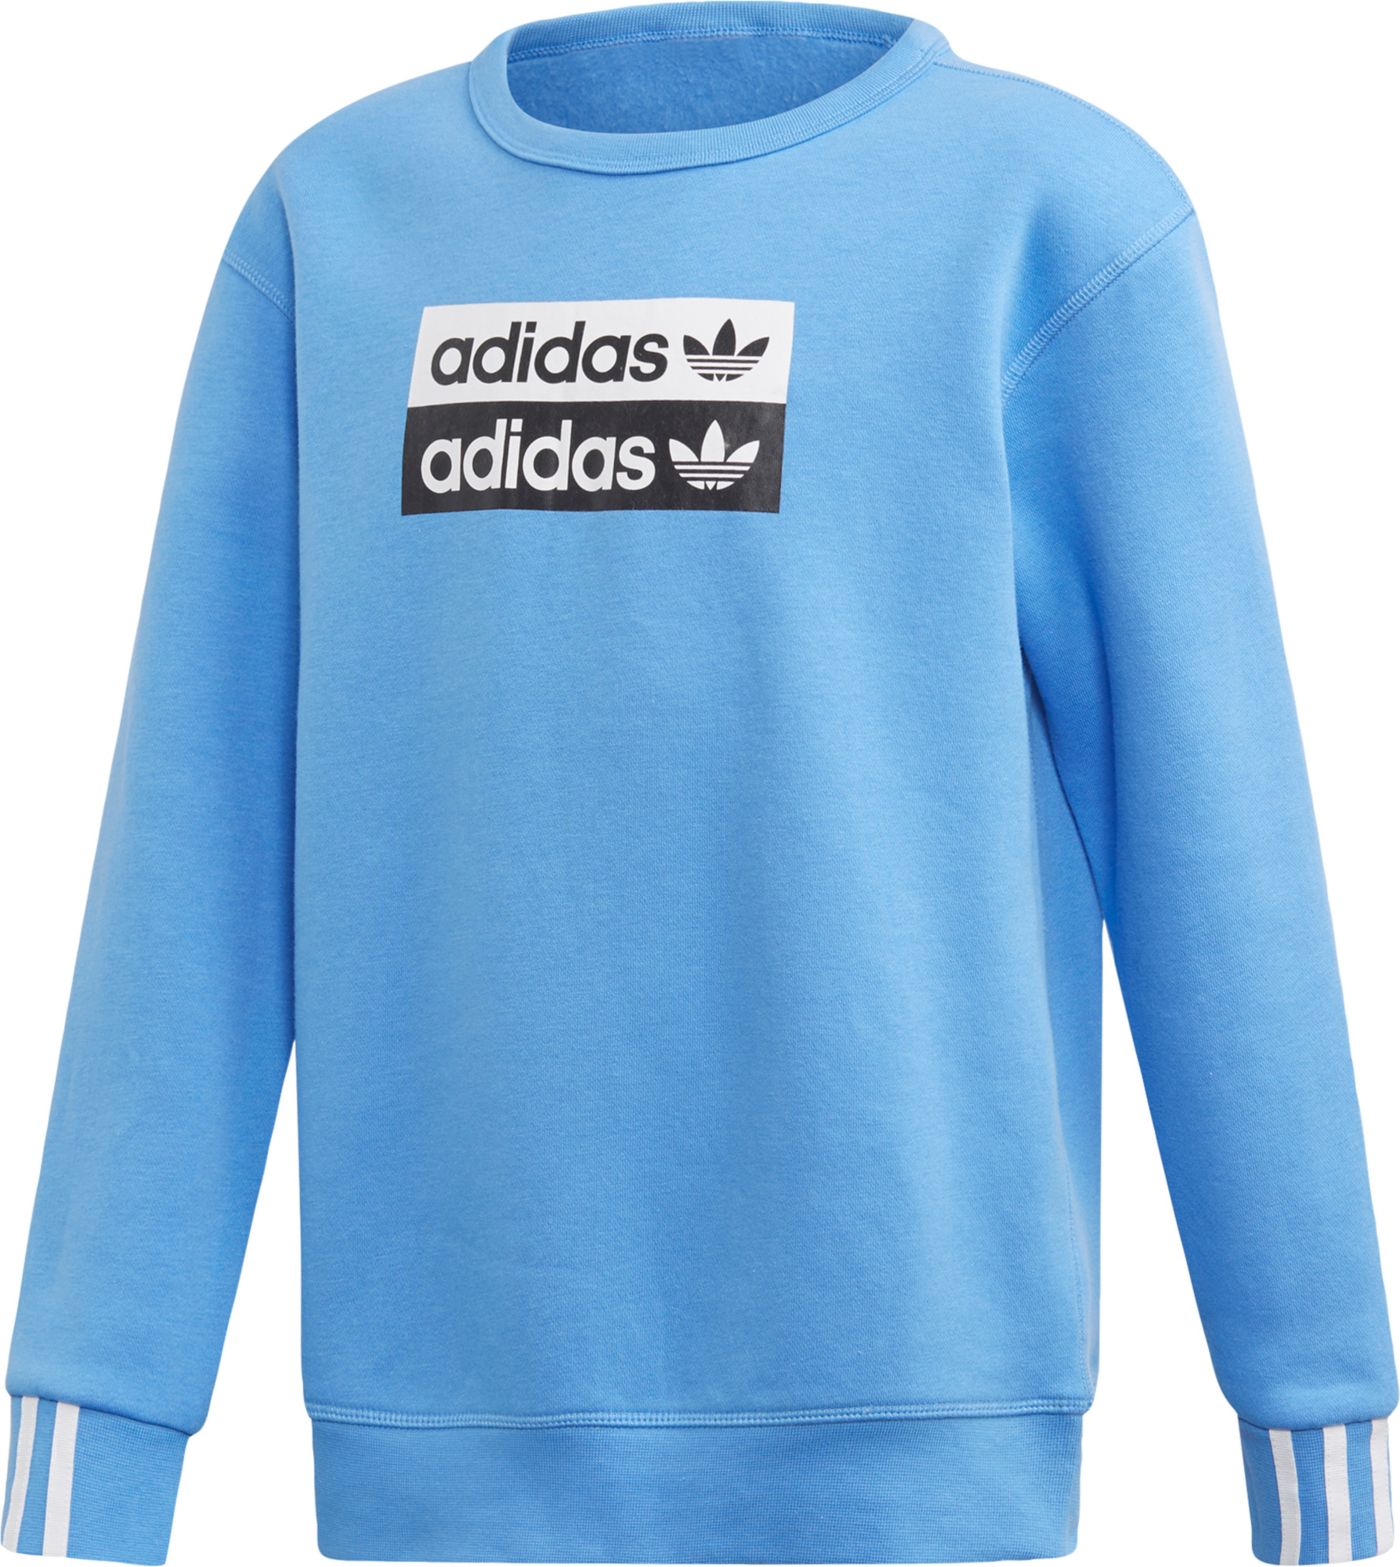 adidas Originals Boy's Vocal Trefoil Crewneck Sweatshirt